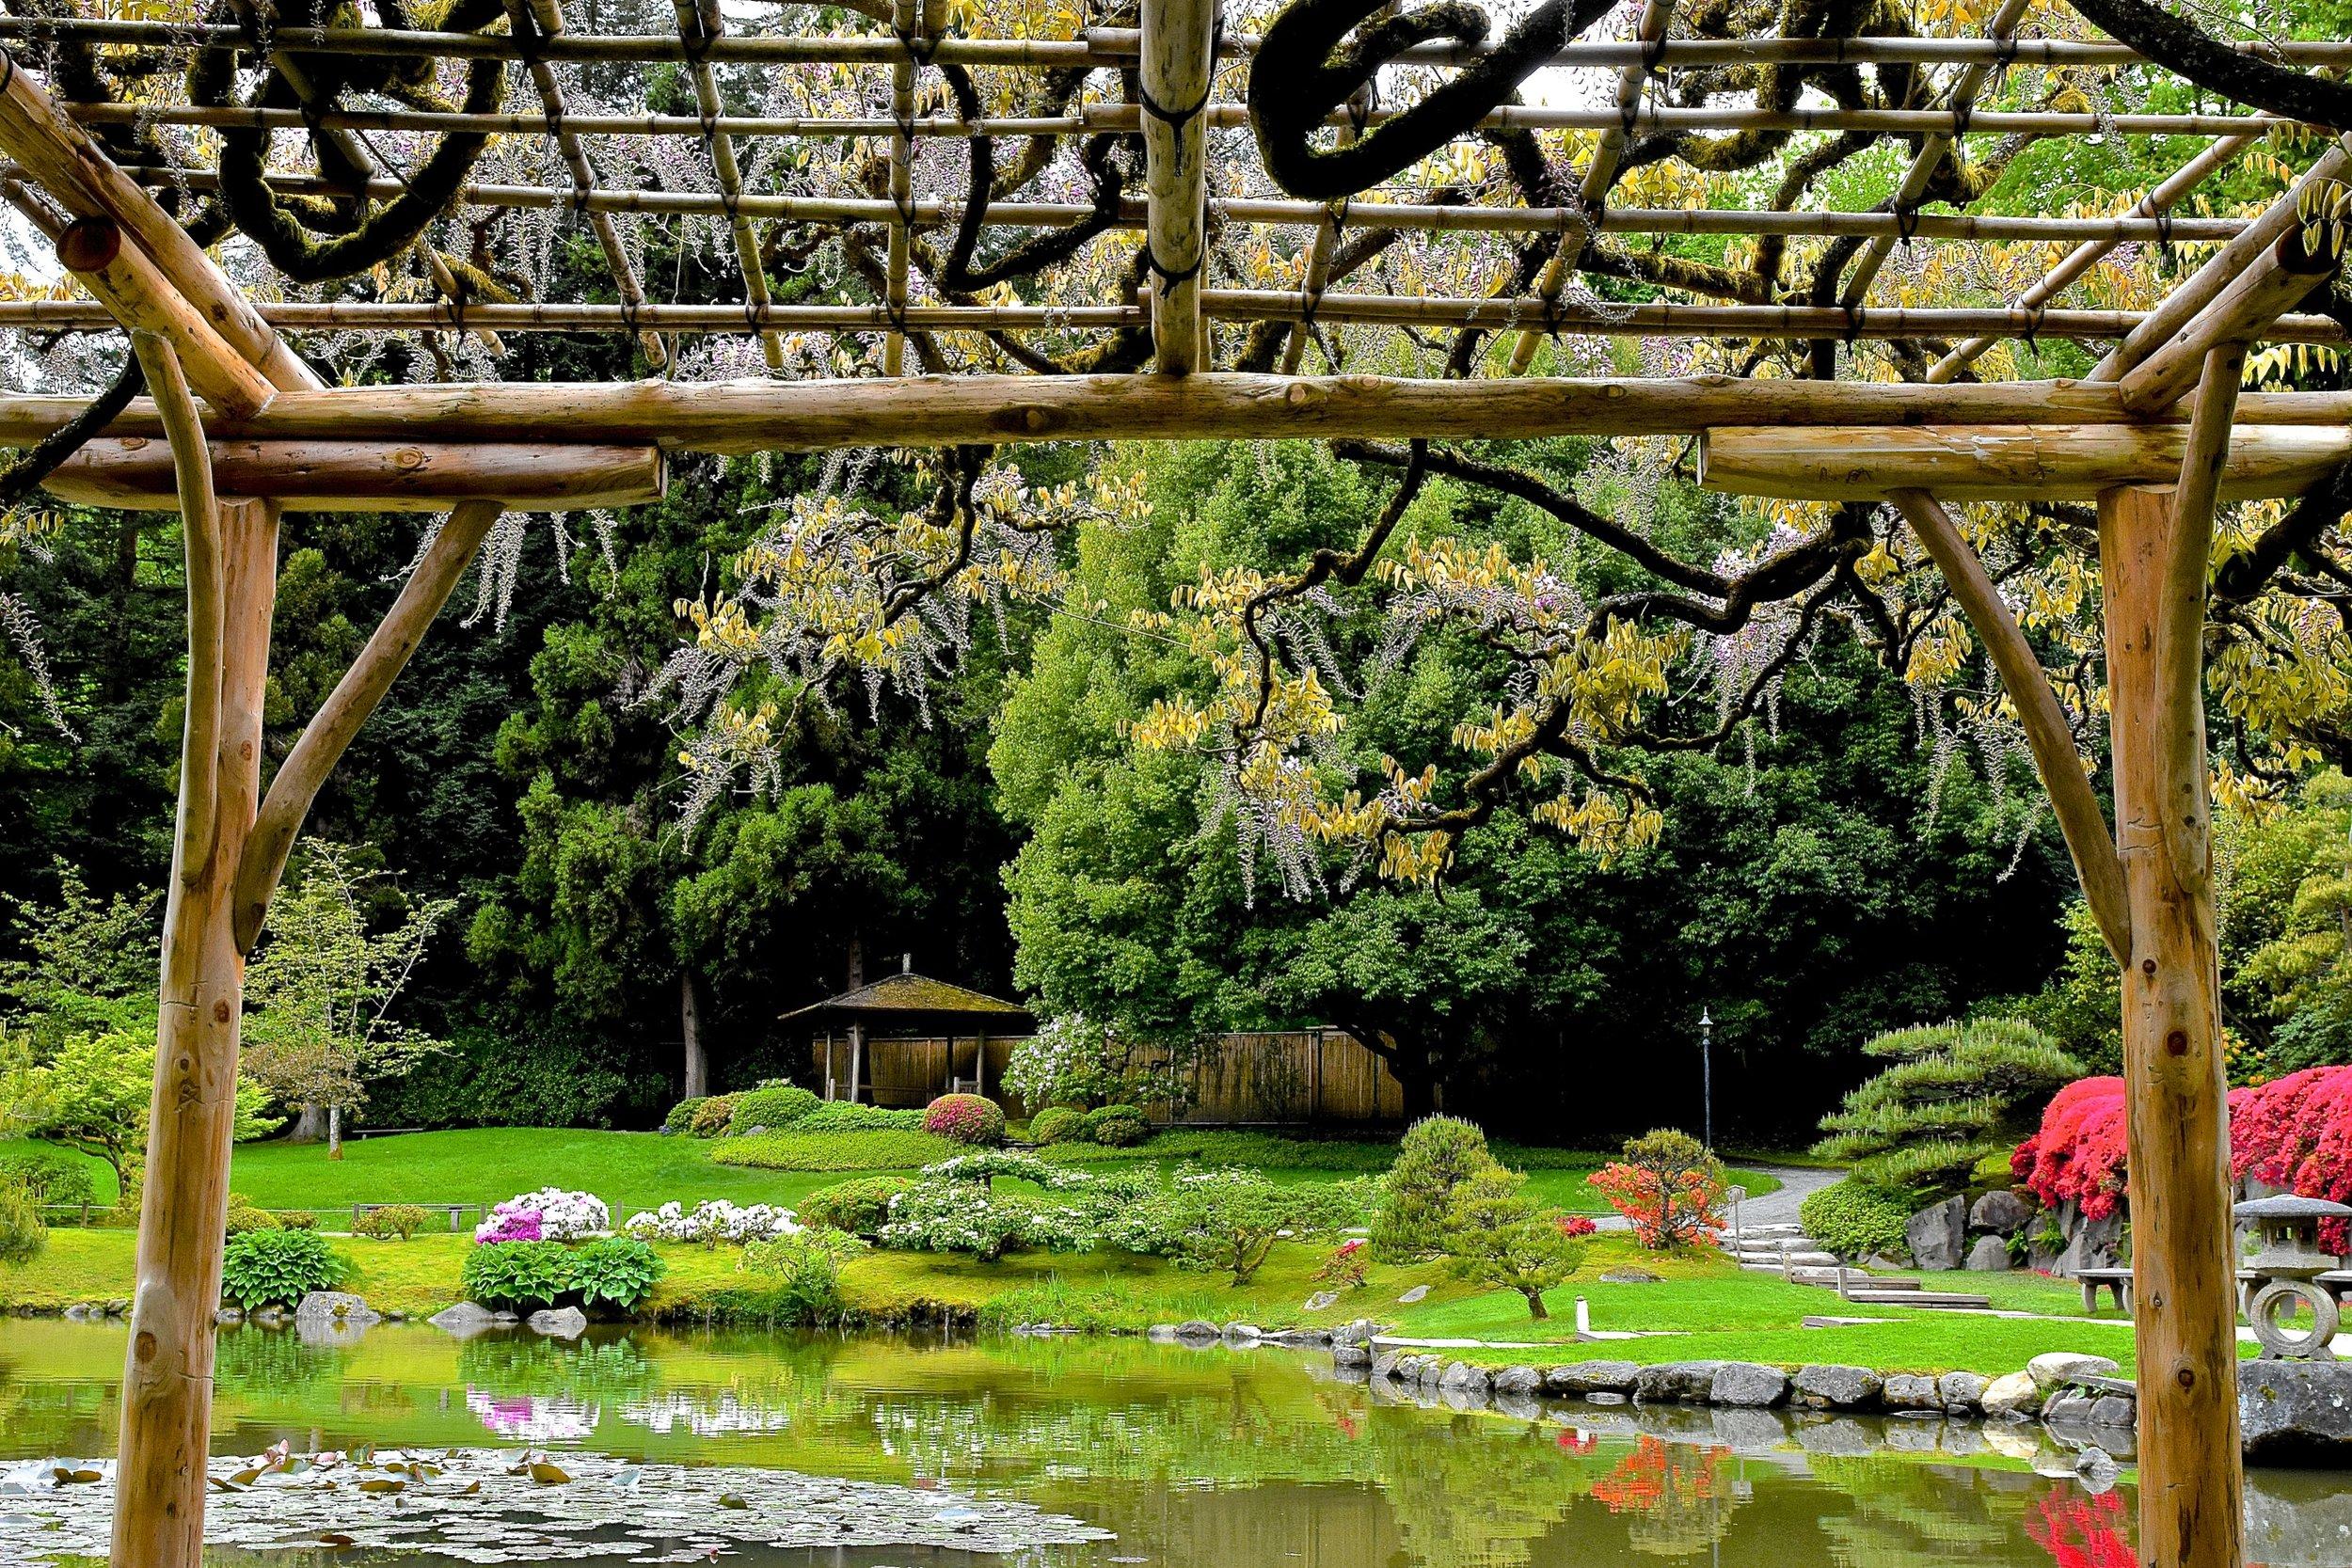 Wild twisting wisteria vines around the arbor (Photo: Aurora Santiago)